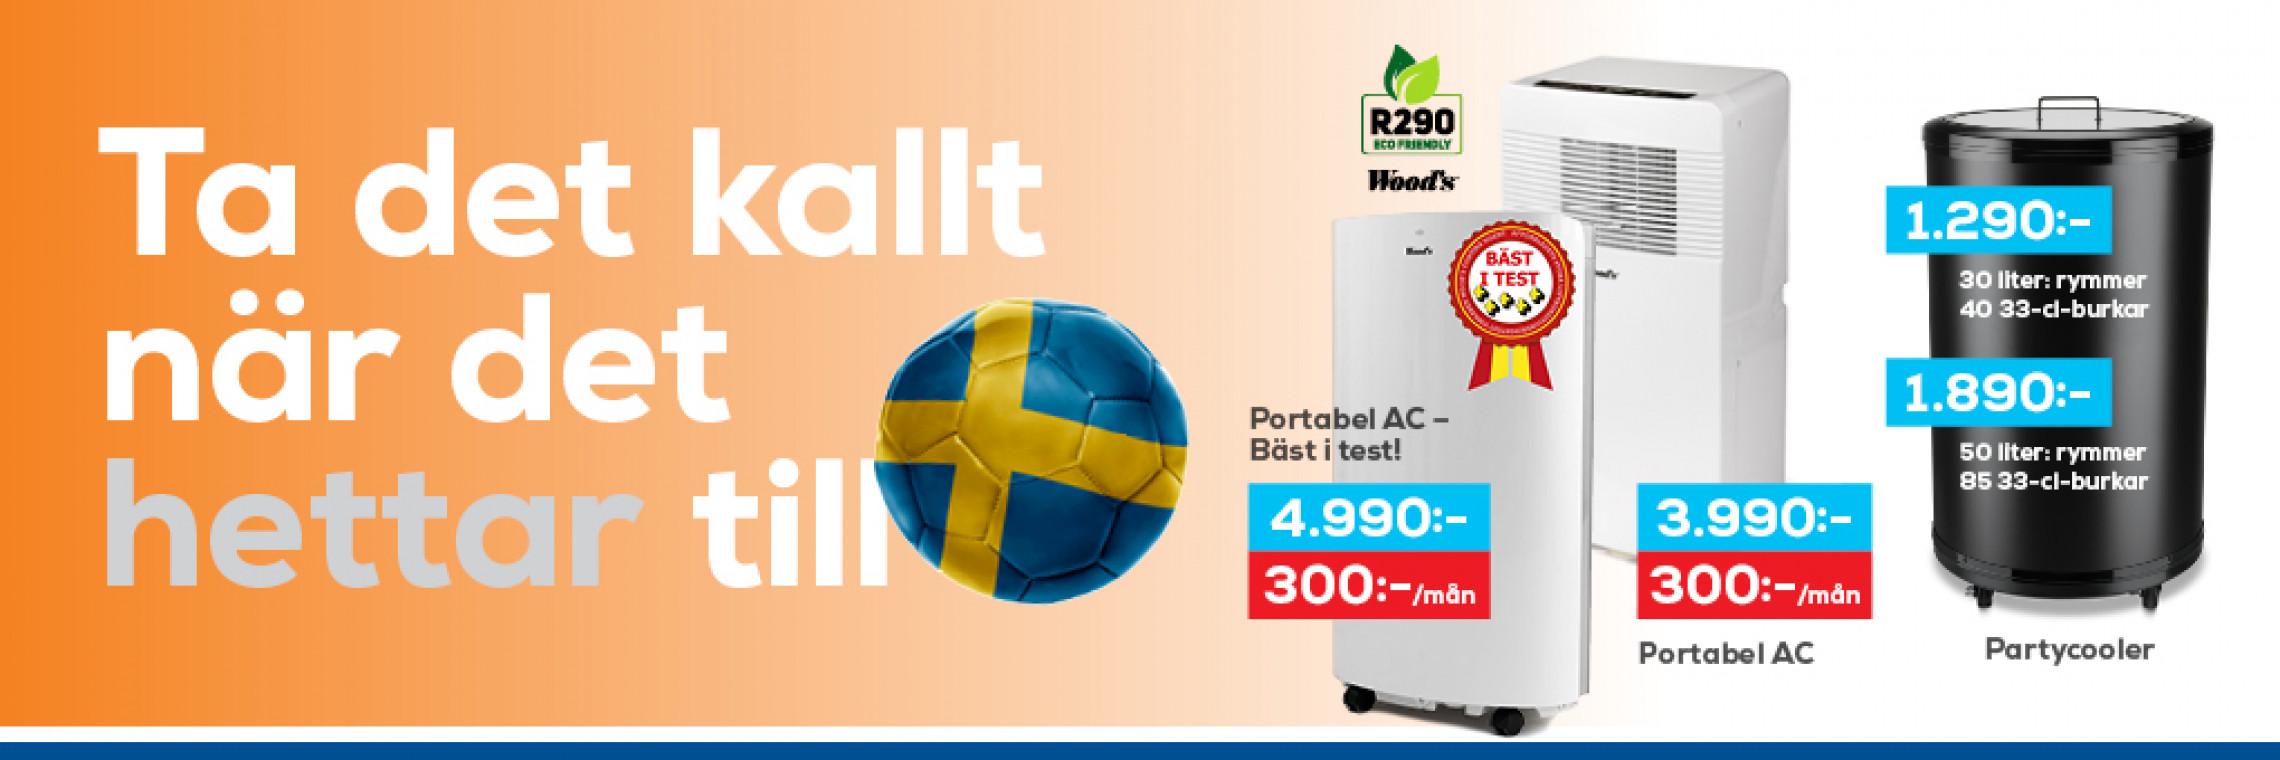 1020x340_slides_po_ac_endast_svensk_boll.jpg